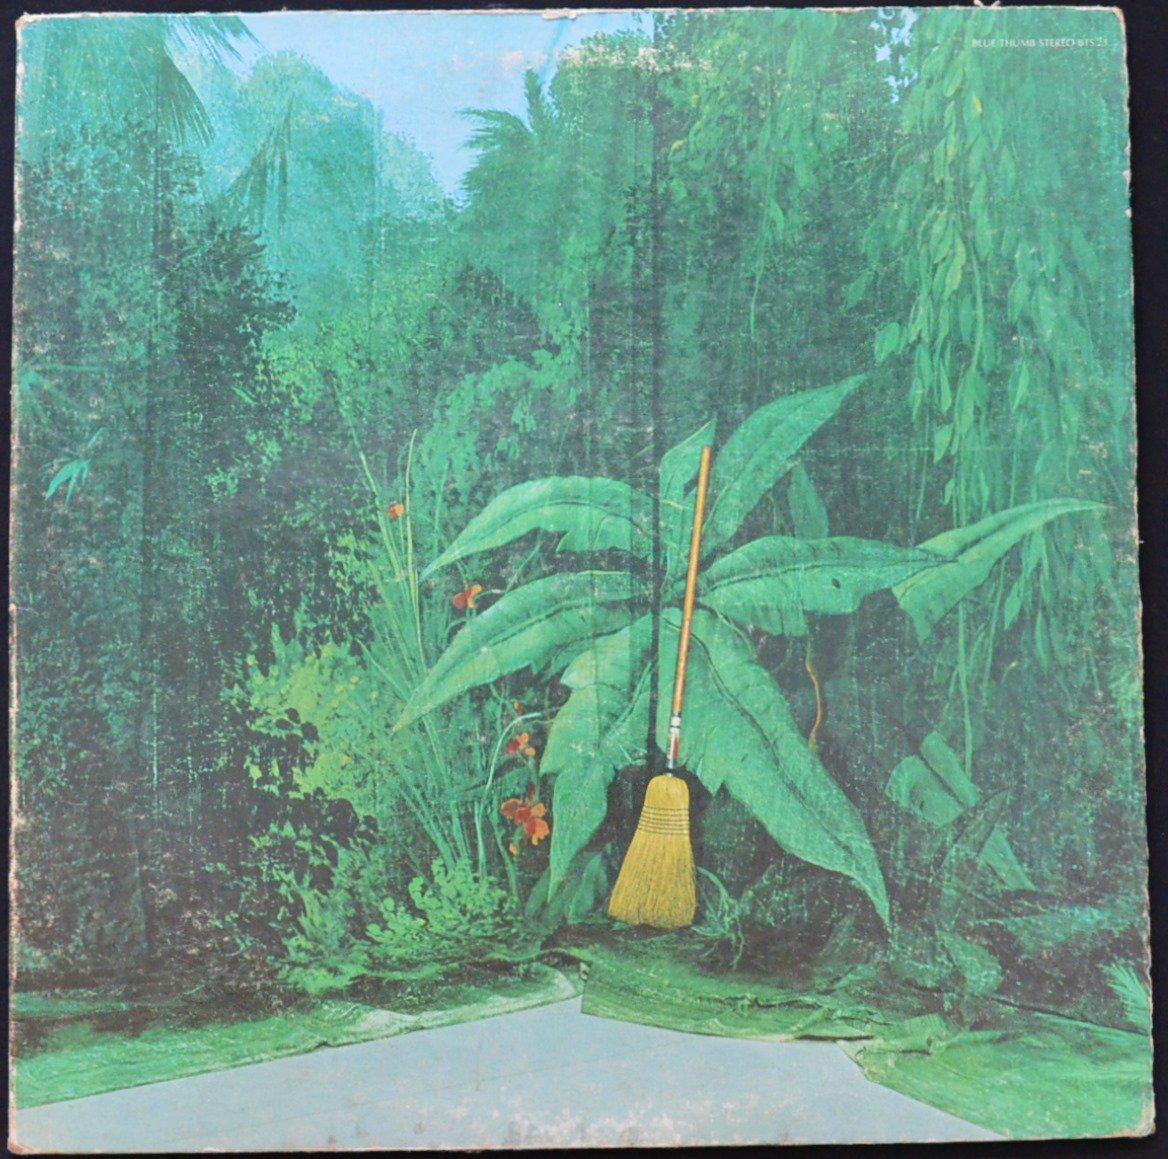 GABOR SZABO / MAGICAL CONNECTION (LP)